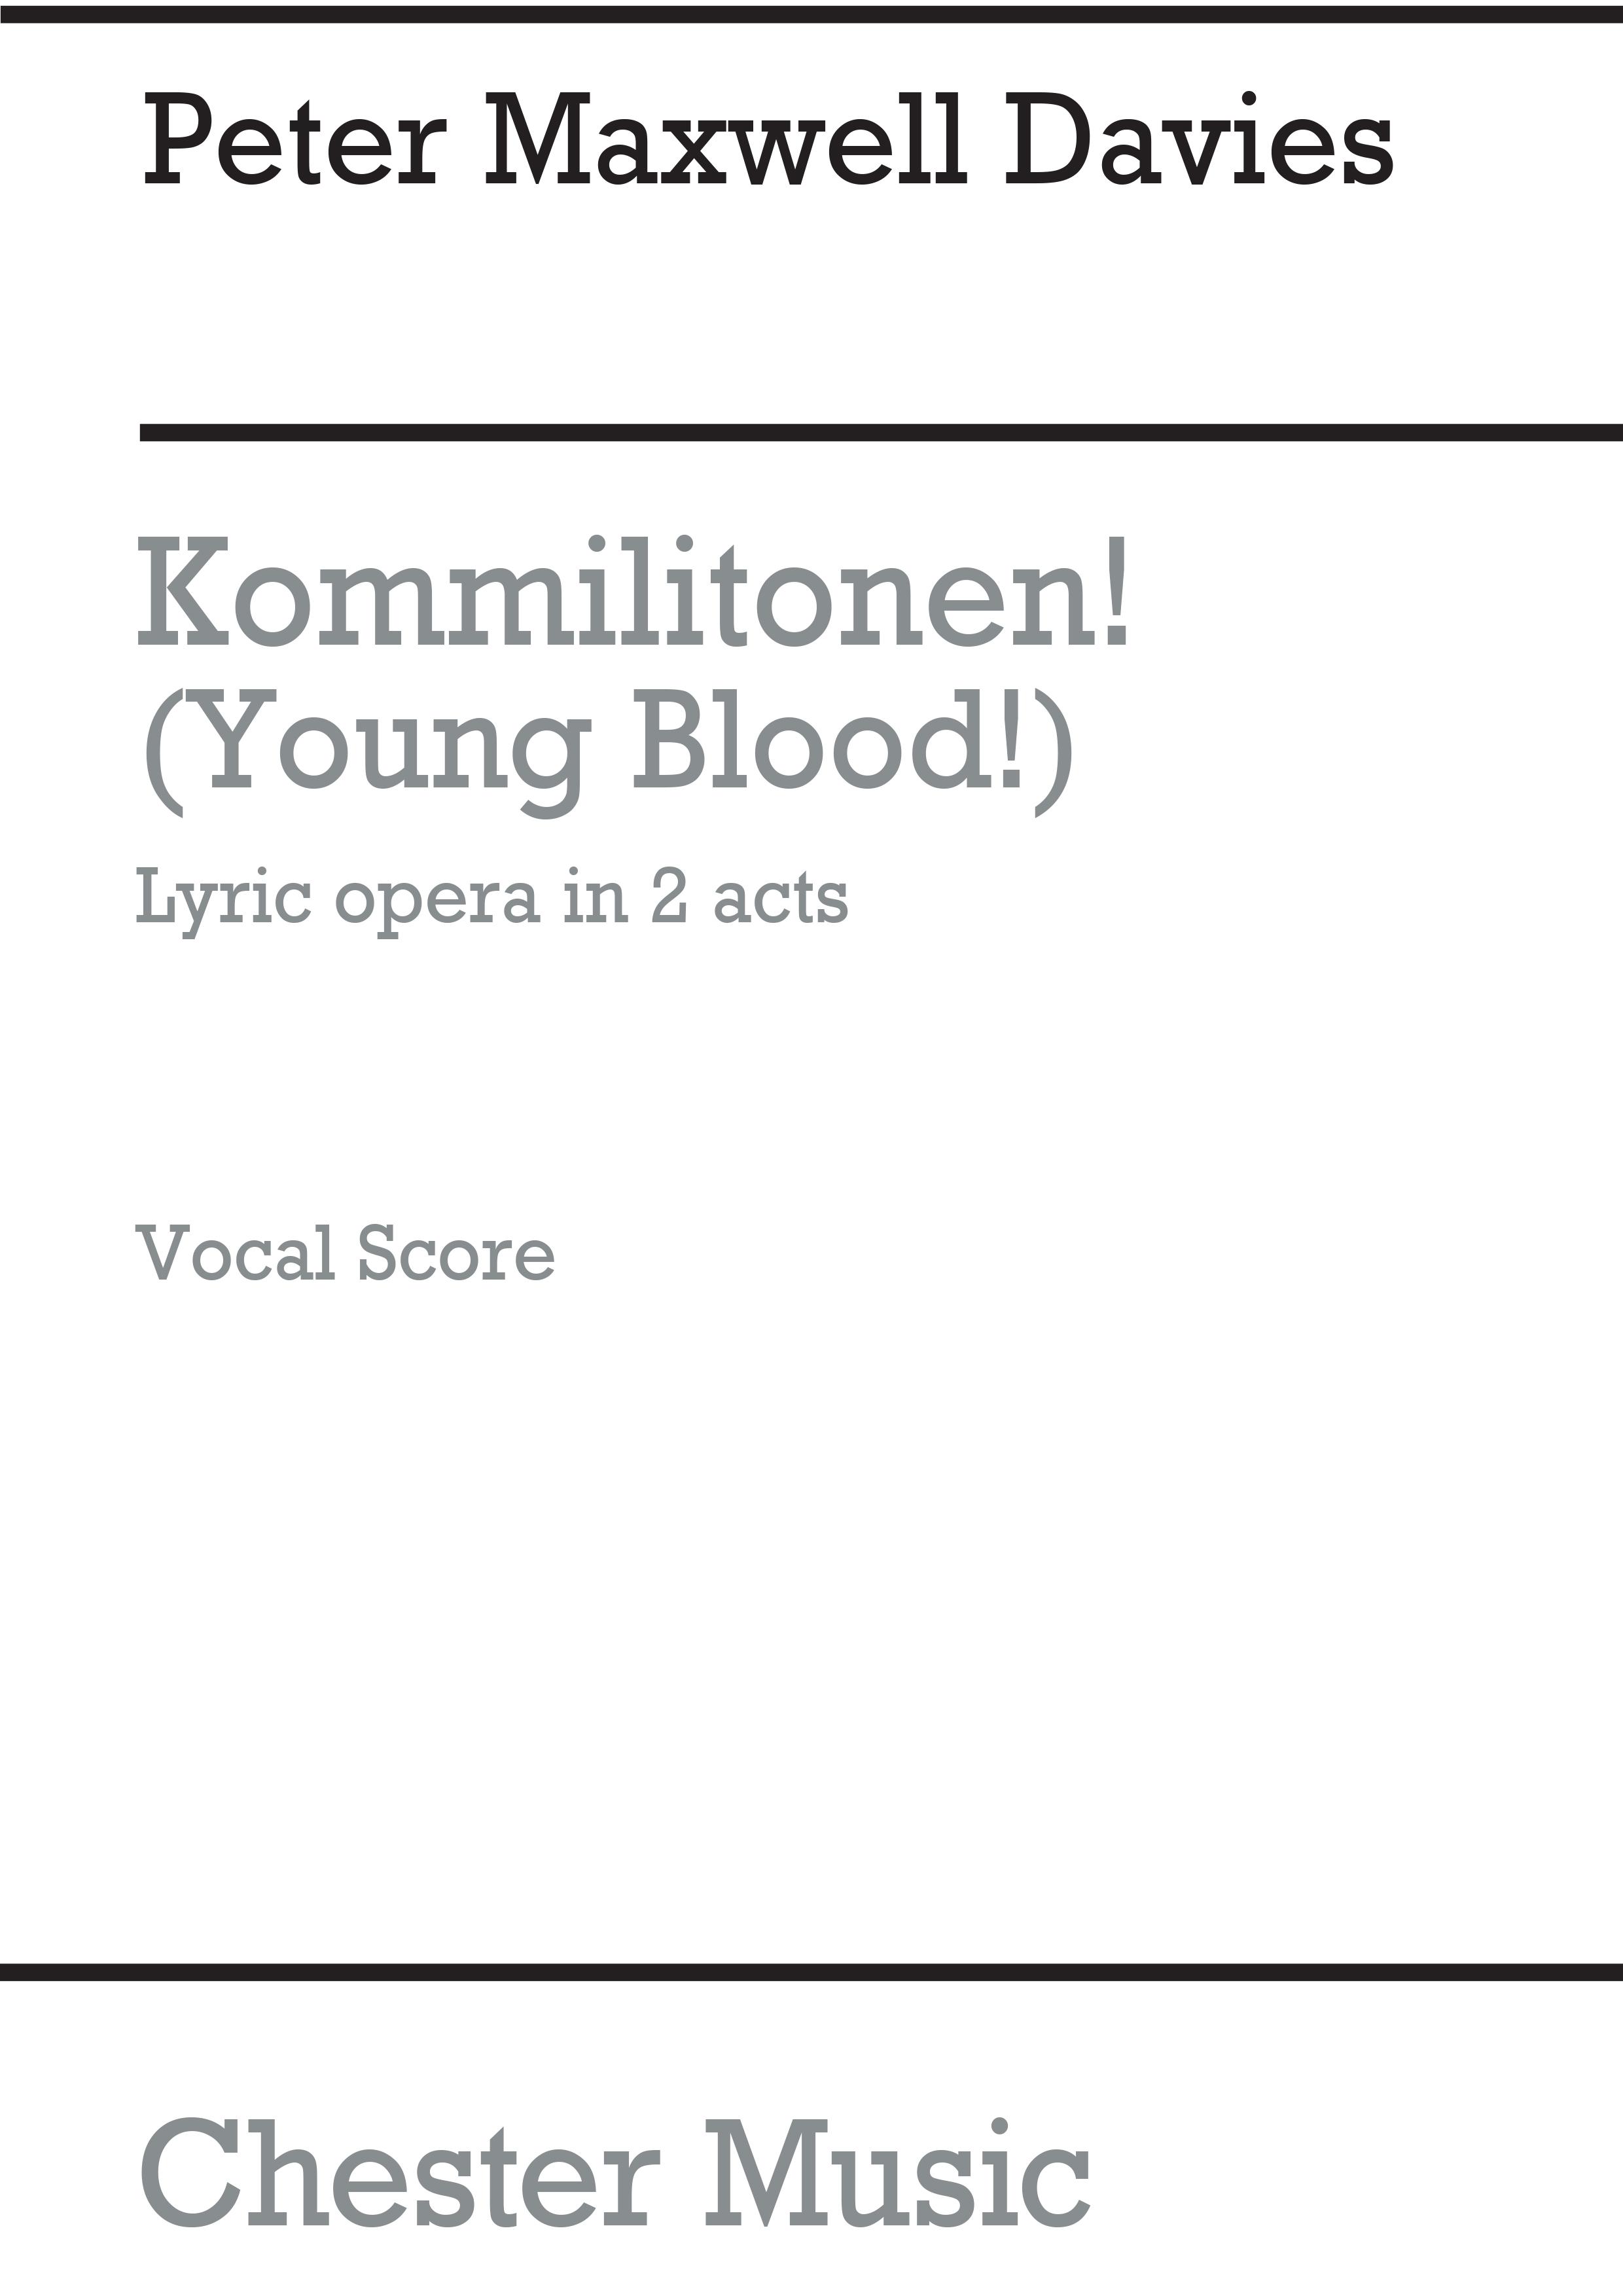 Peter Maxwell Davies: Kommilitonen! (Young Blood!) - Vocal Score: Opera: Vocal